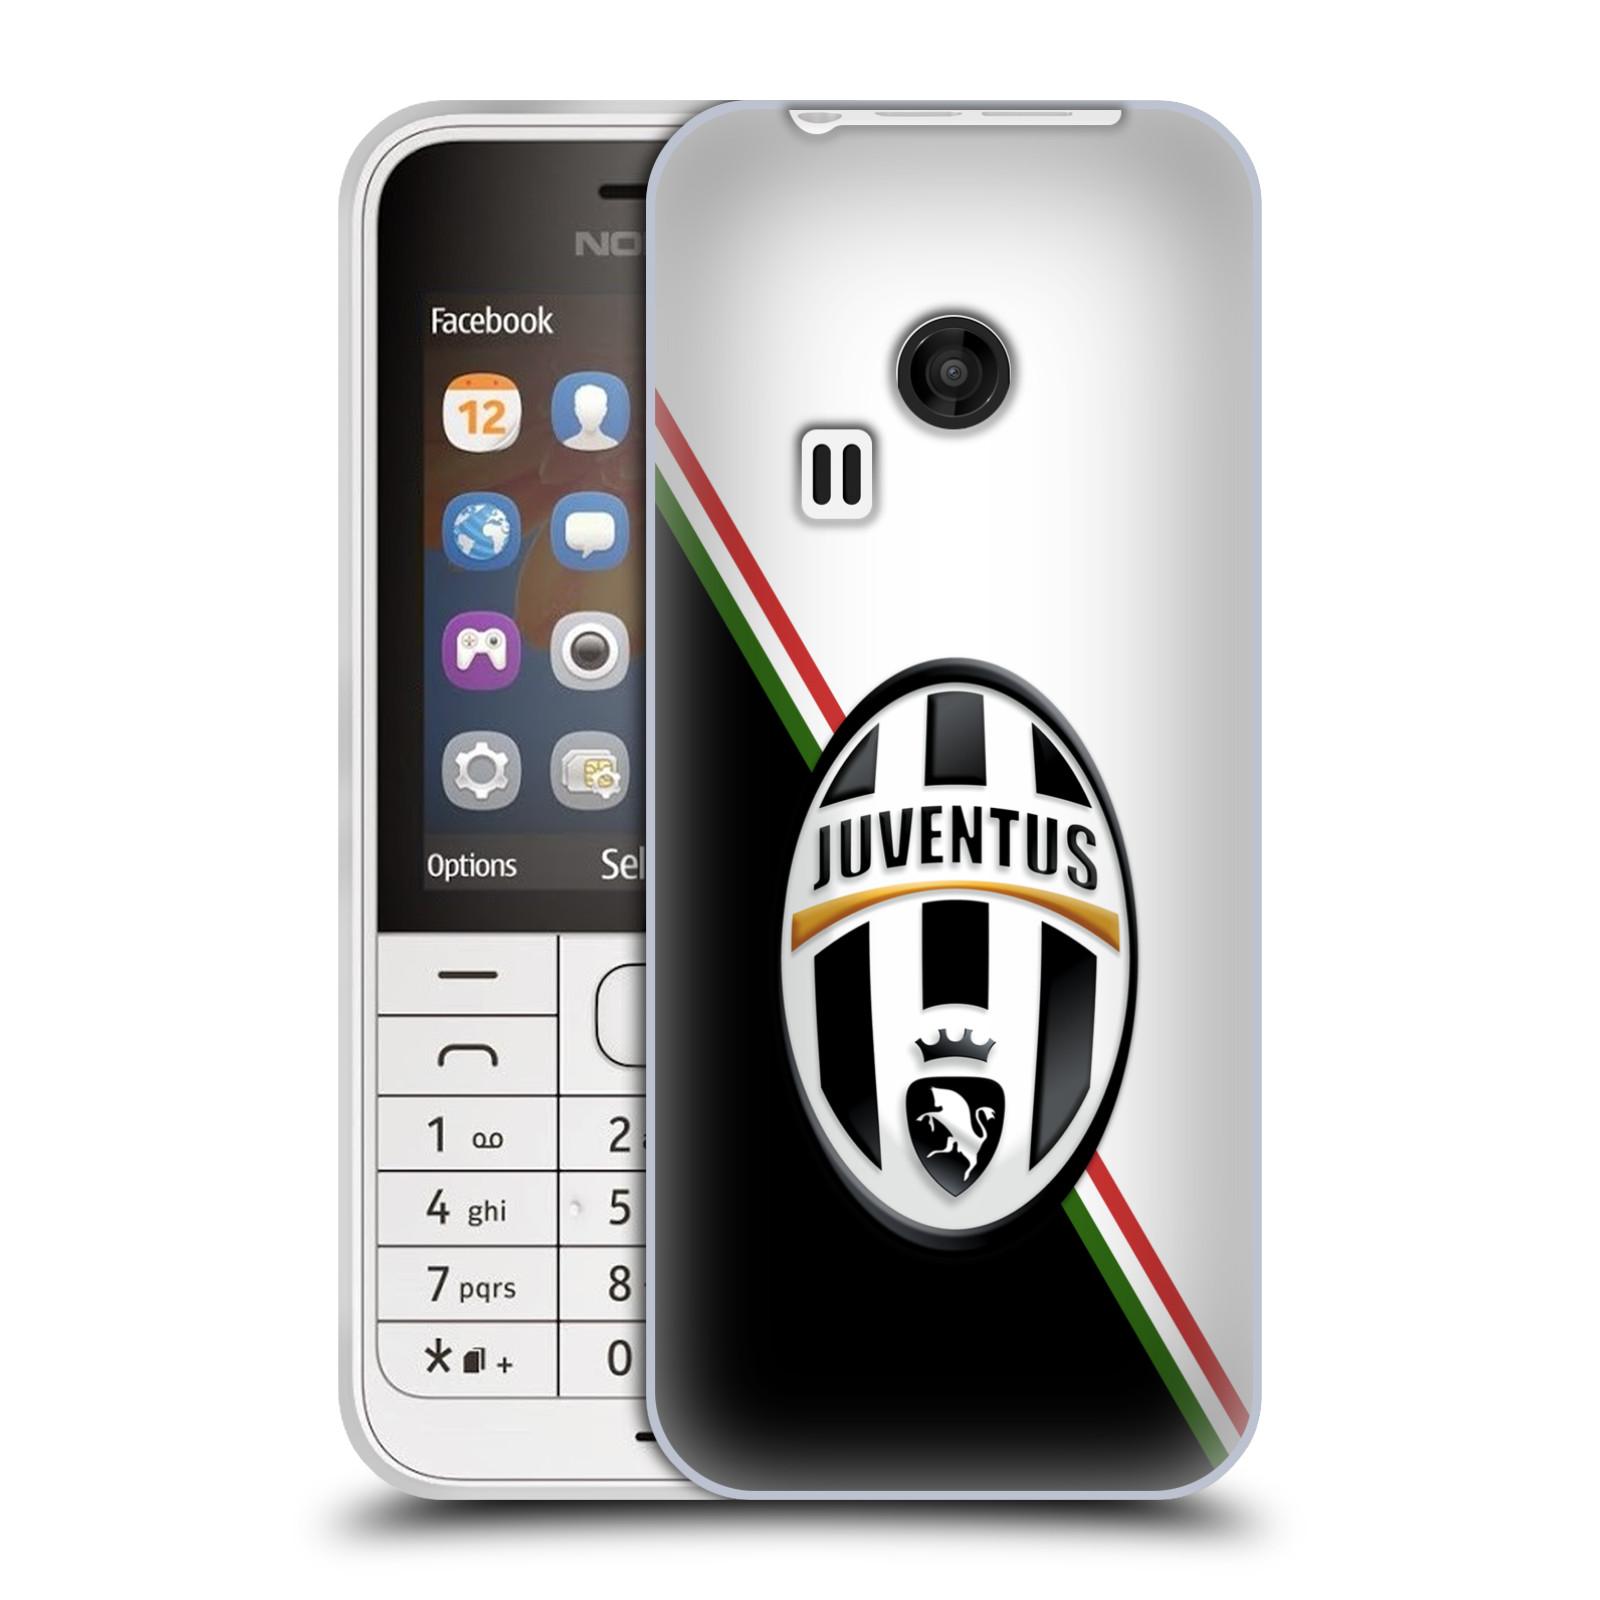 Silikonové pouzdro na mobil Nokia 220 HEAD CASE Juventus FC - Black and White (Silikonový kryt či obal na mobilní telefon Juventus FC Official pro Nokia 220 a 220 Dual SIM)